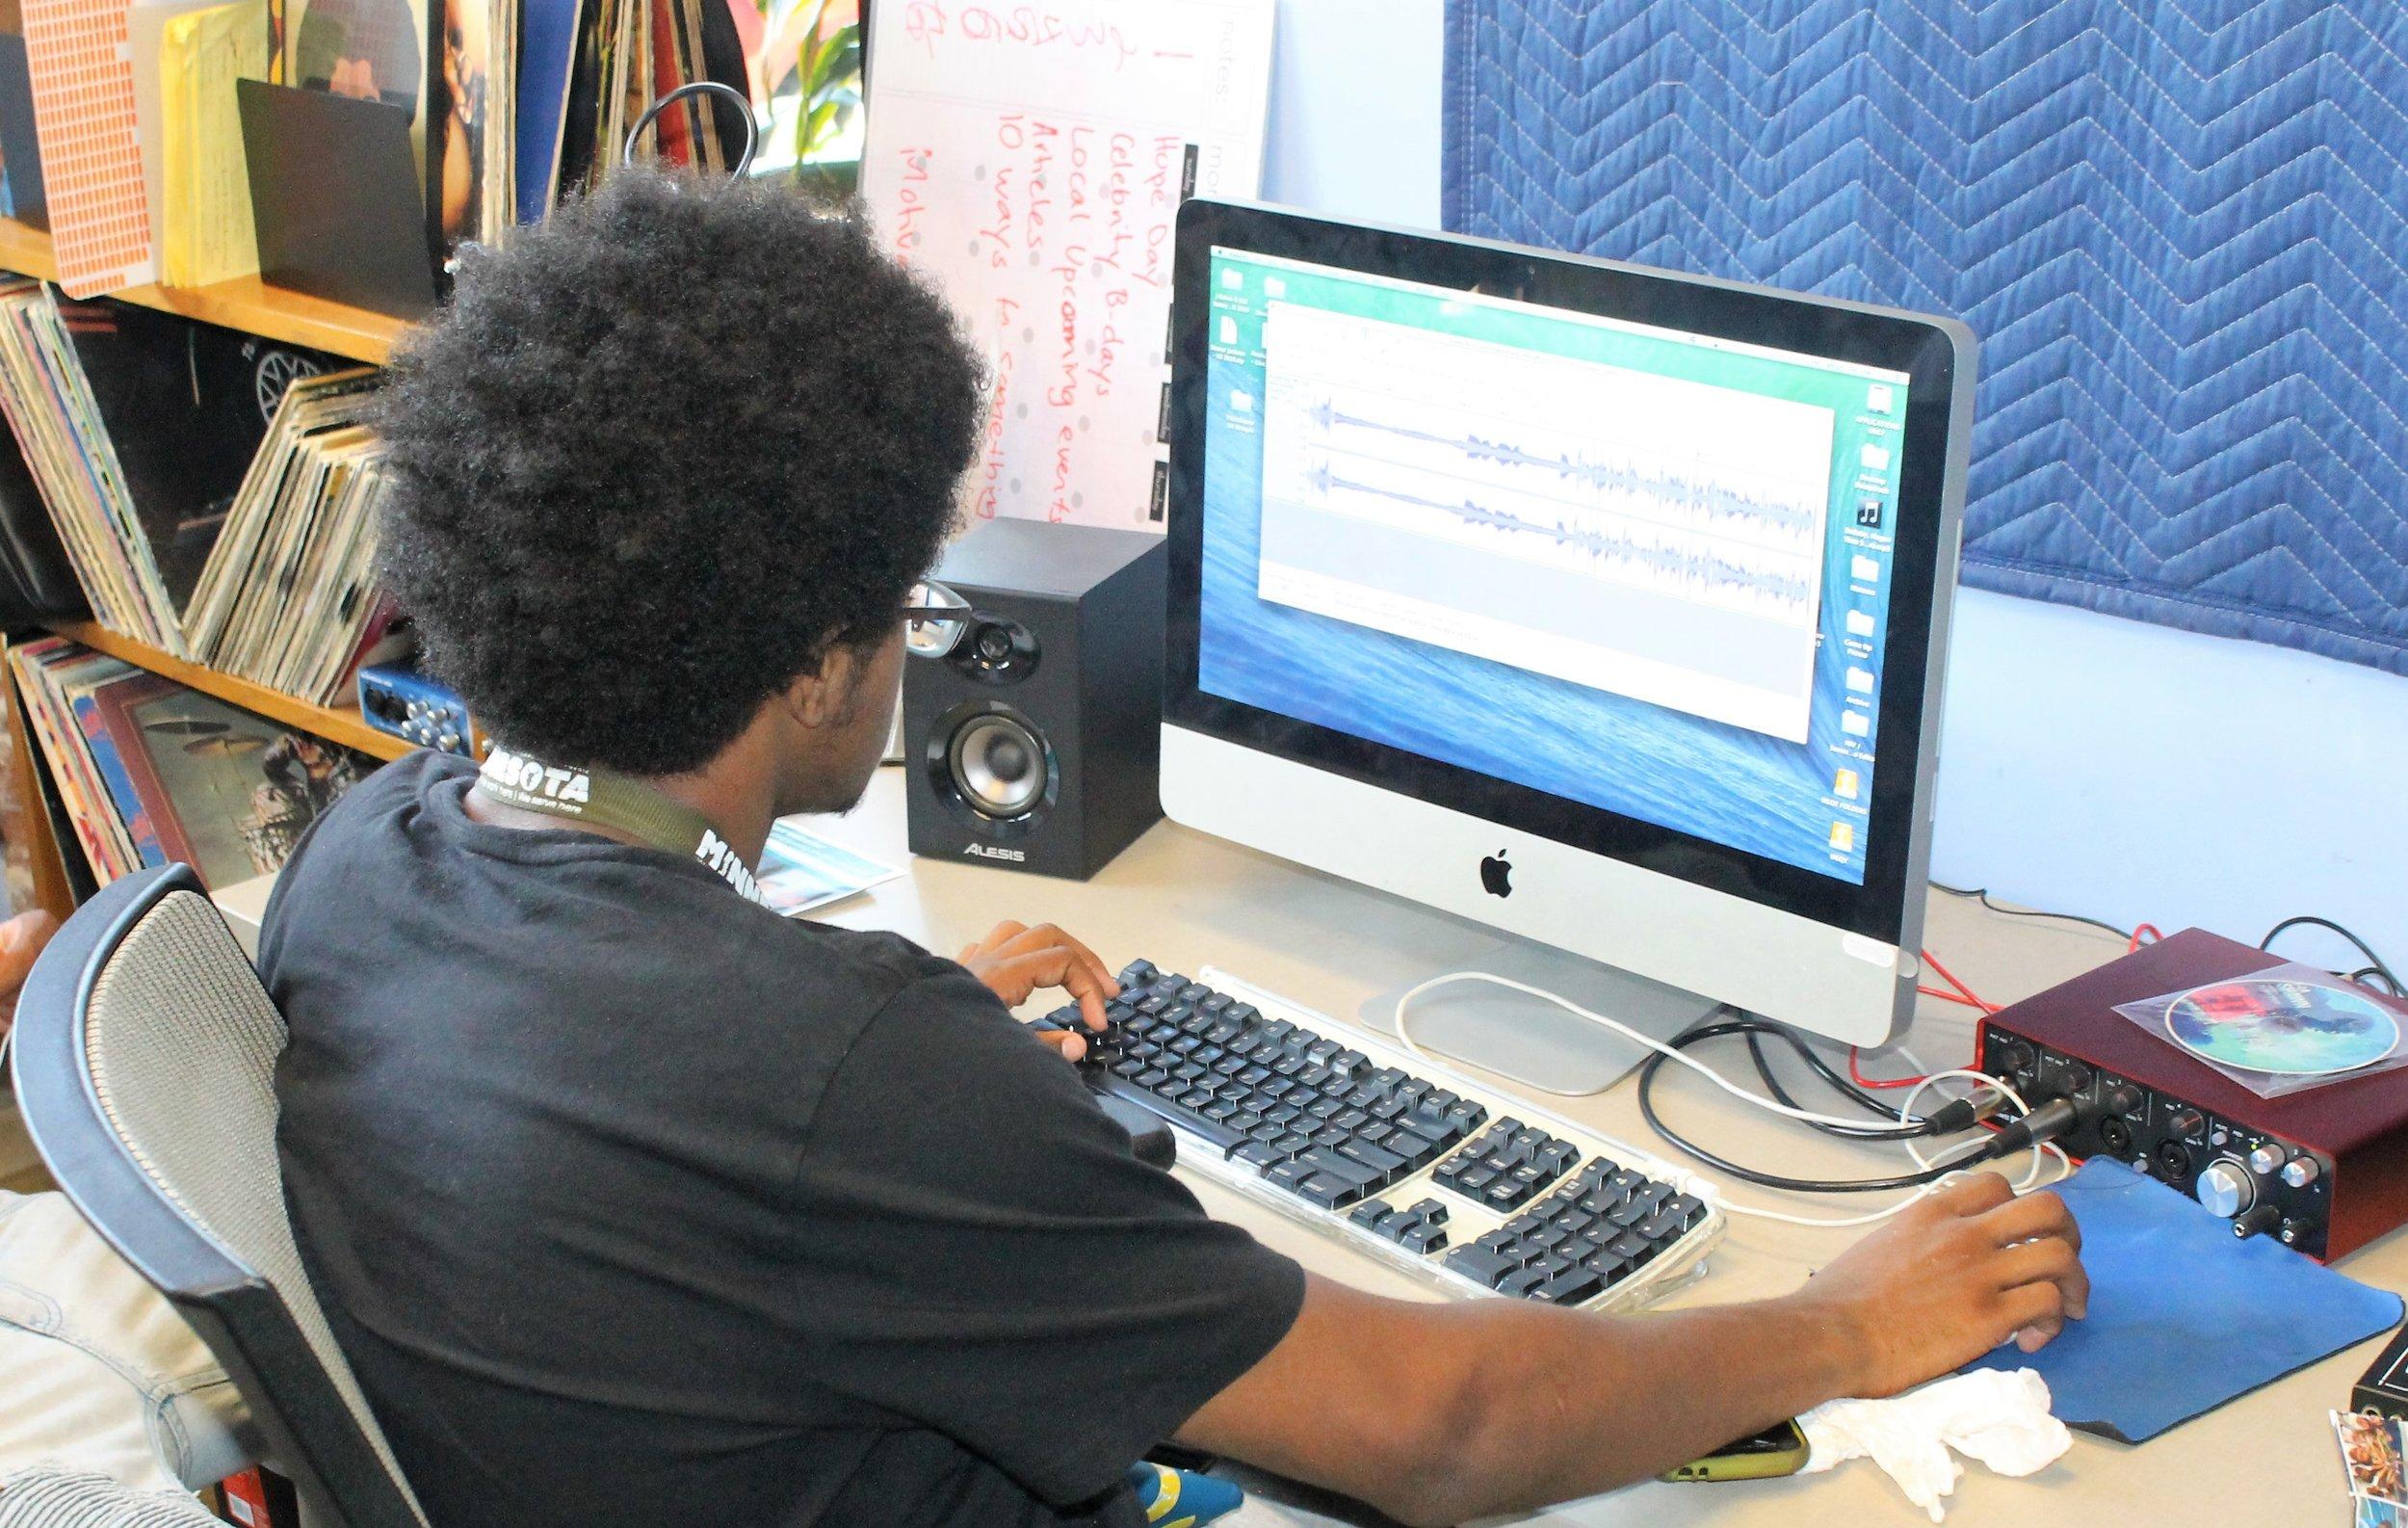 New Lens Urban Mentoring Society #NewLensSociety George Washington Carver Experience (4).JPG